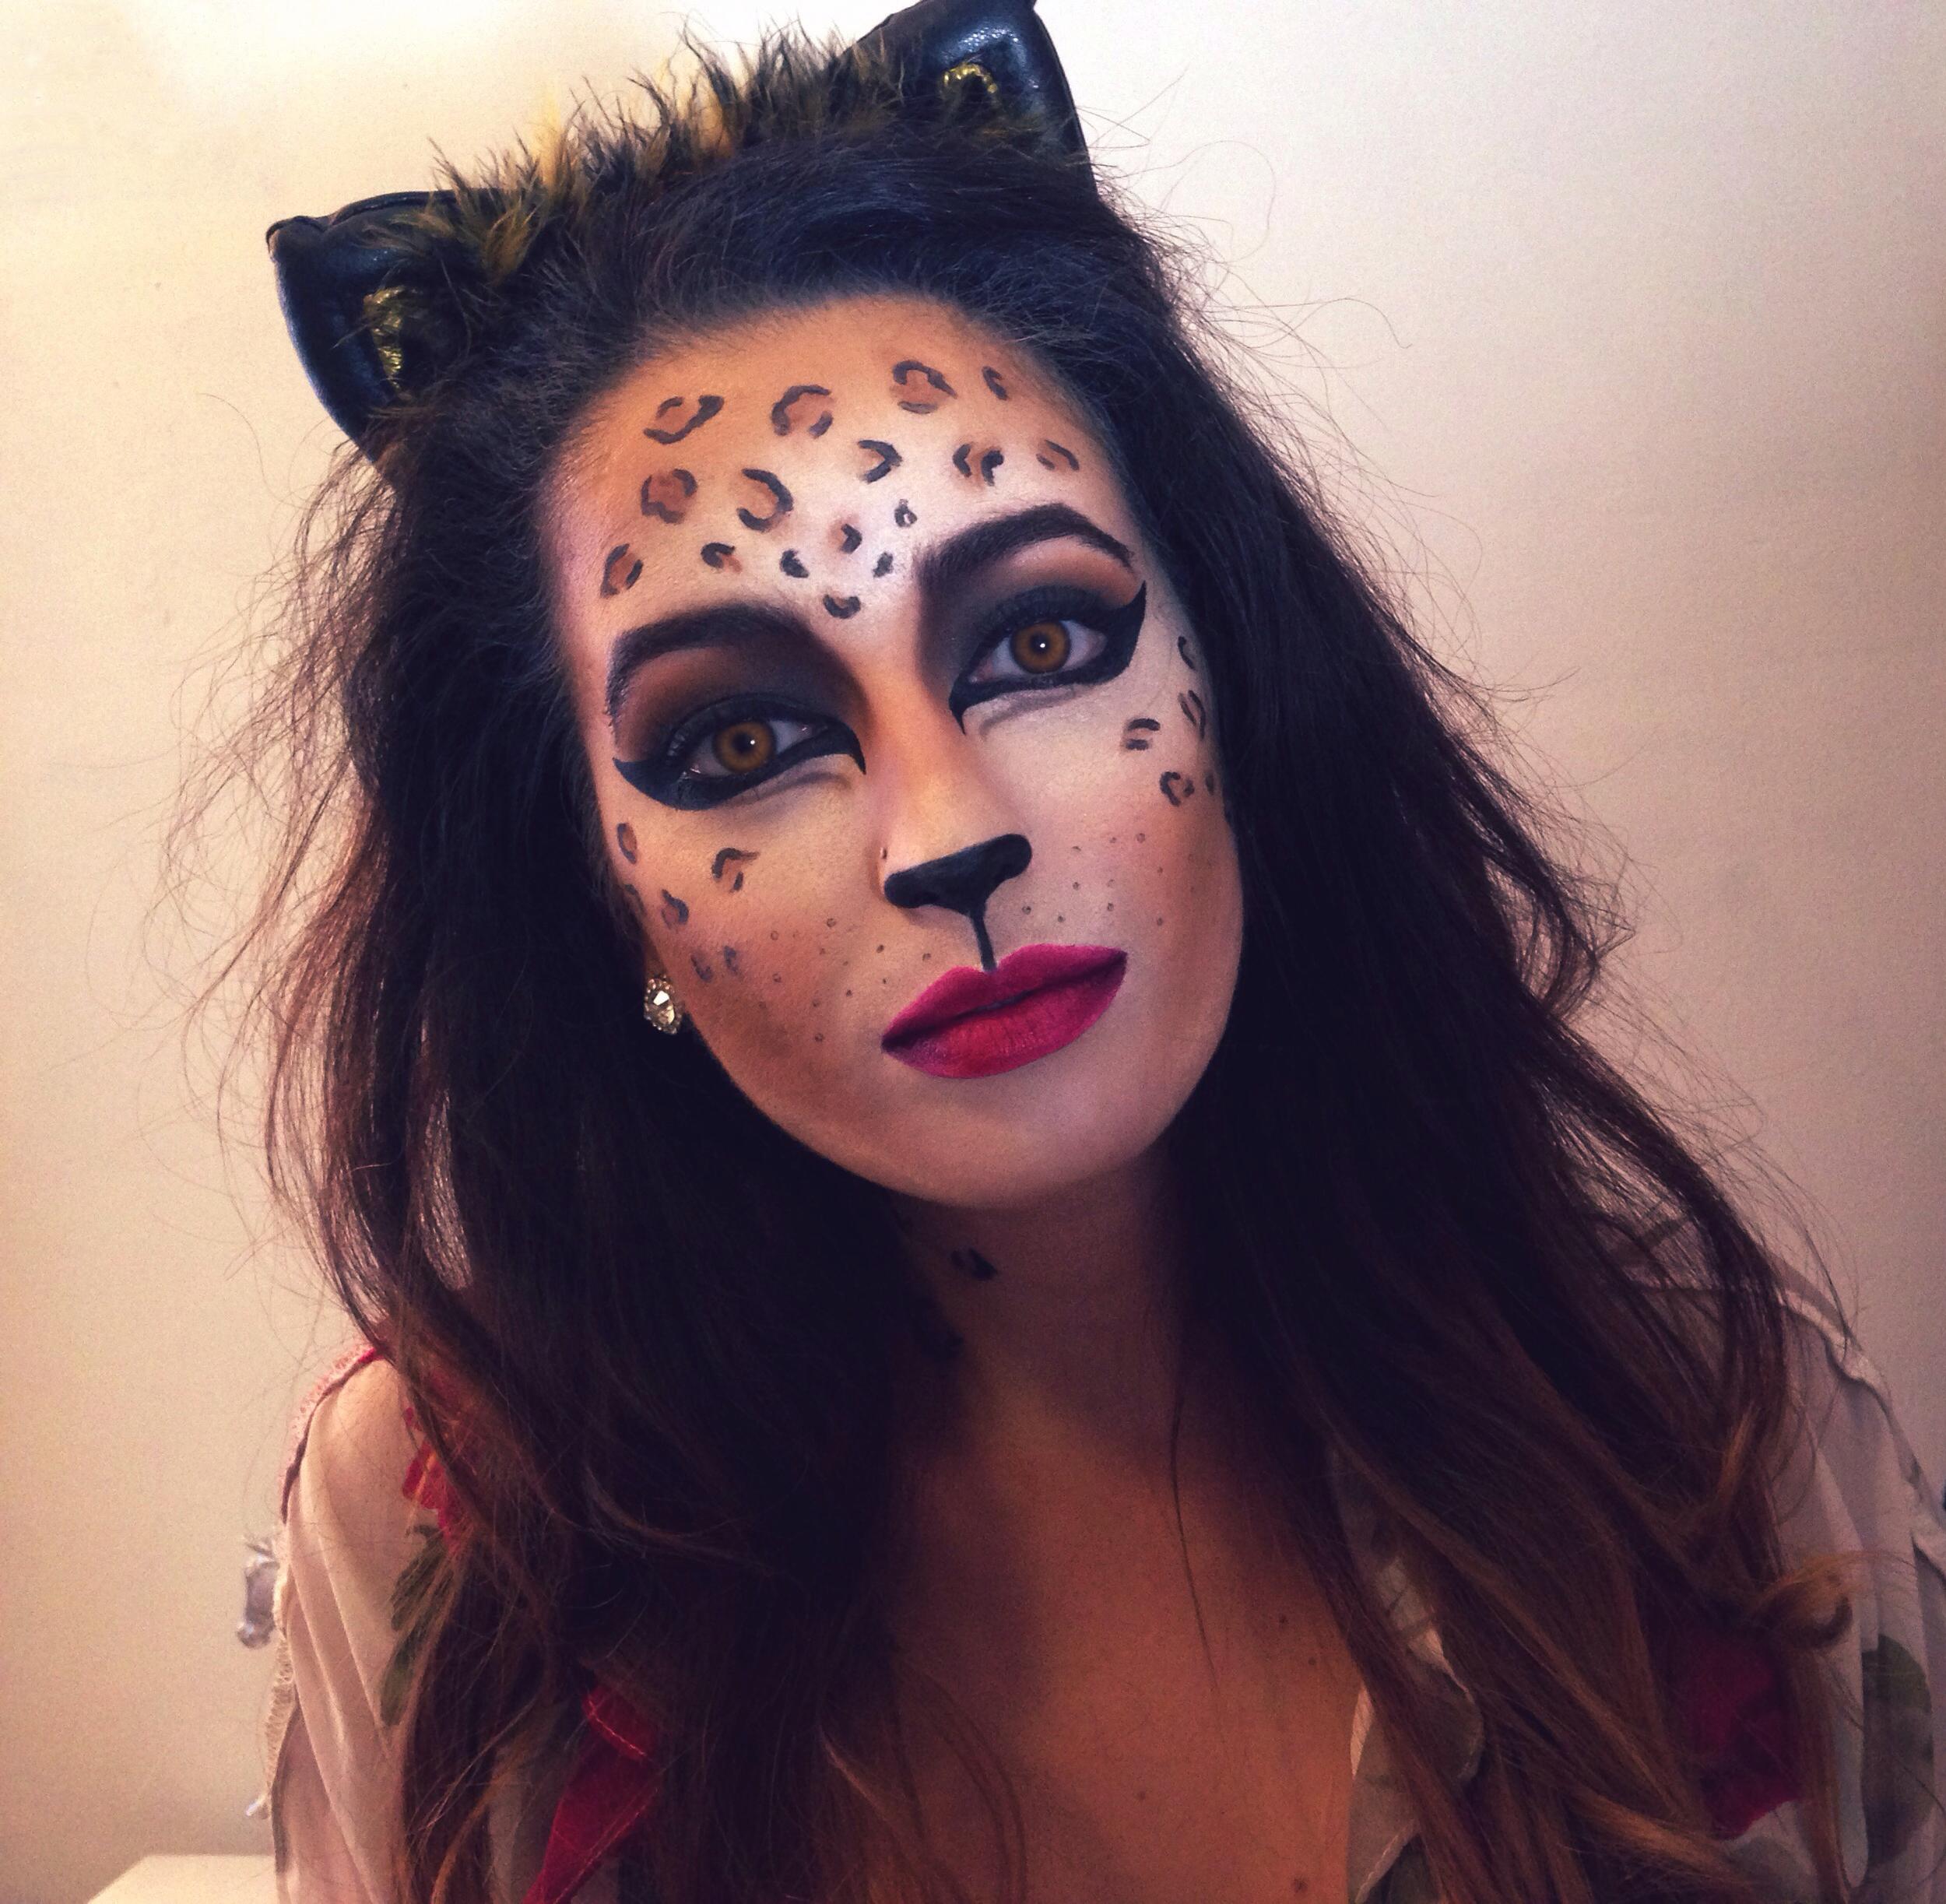 halloween-makeup-diy-leopard-animal-mua-costume-sfx-glam-cat-cosplay-look-4.jpg